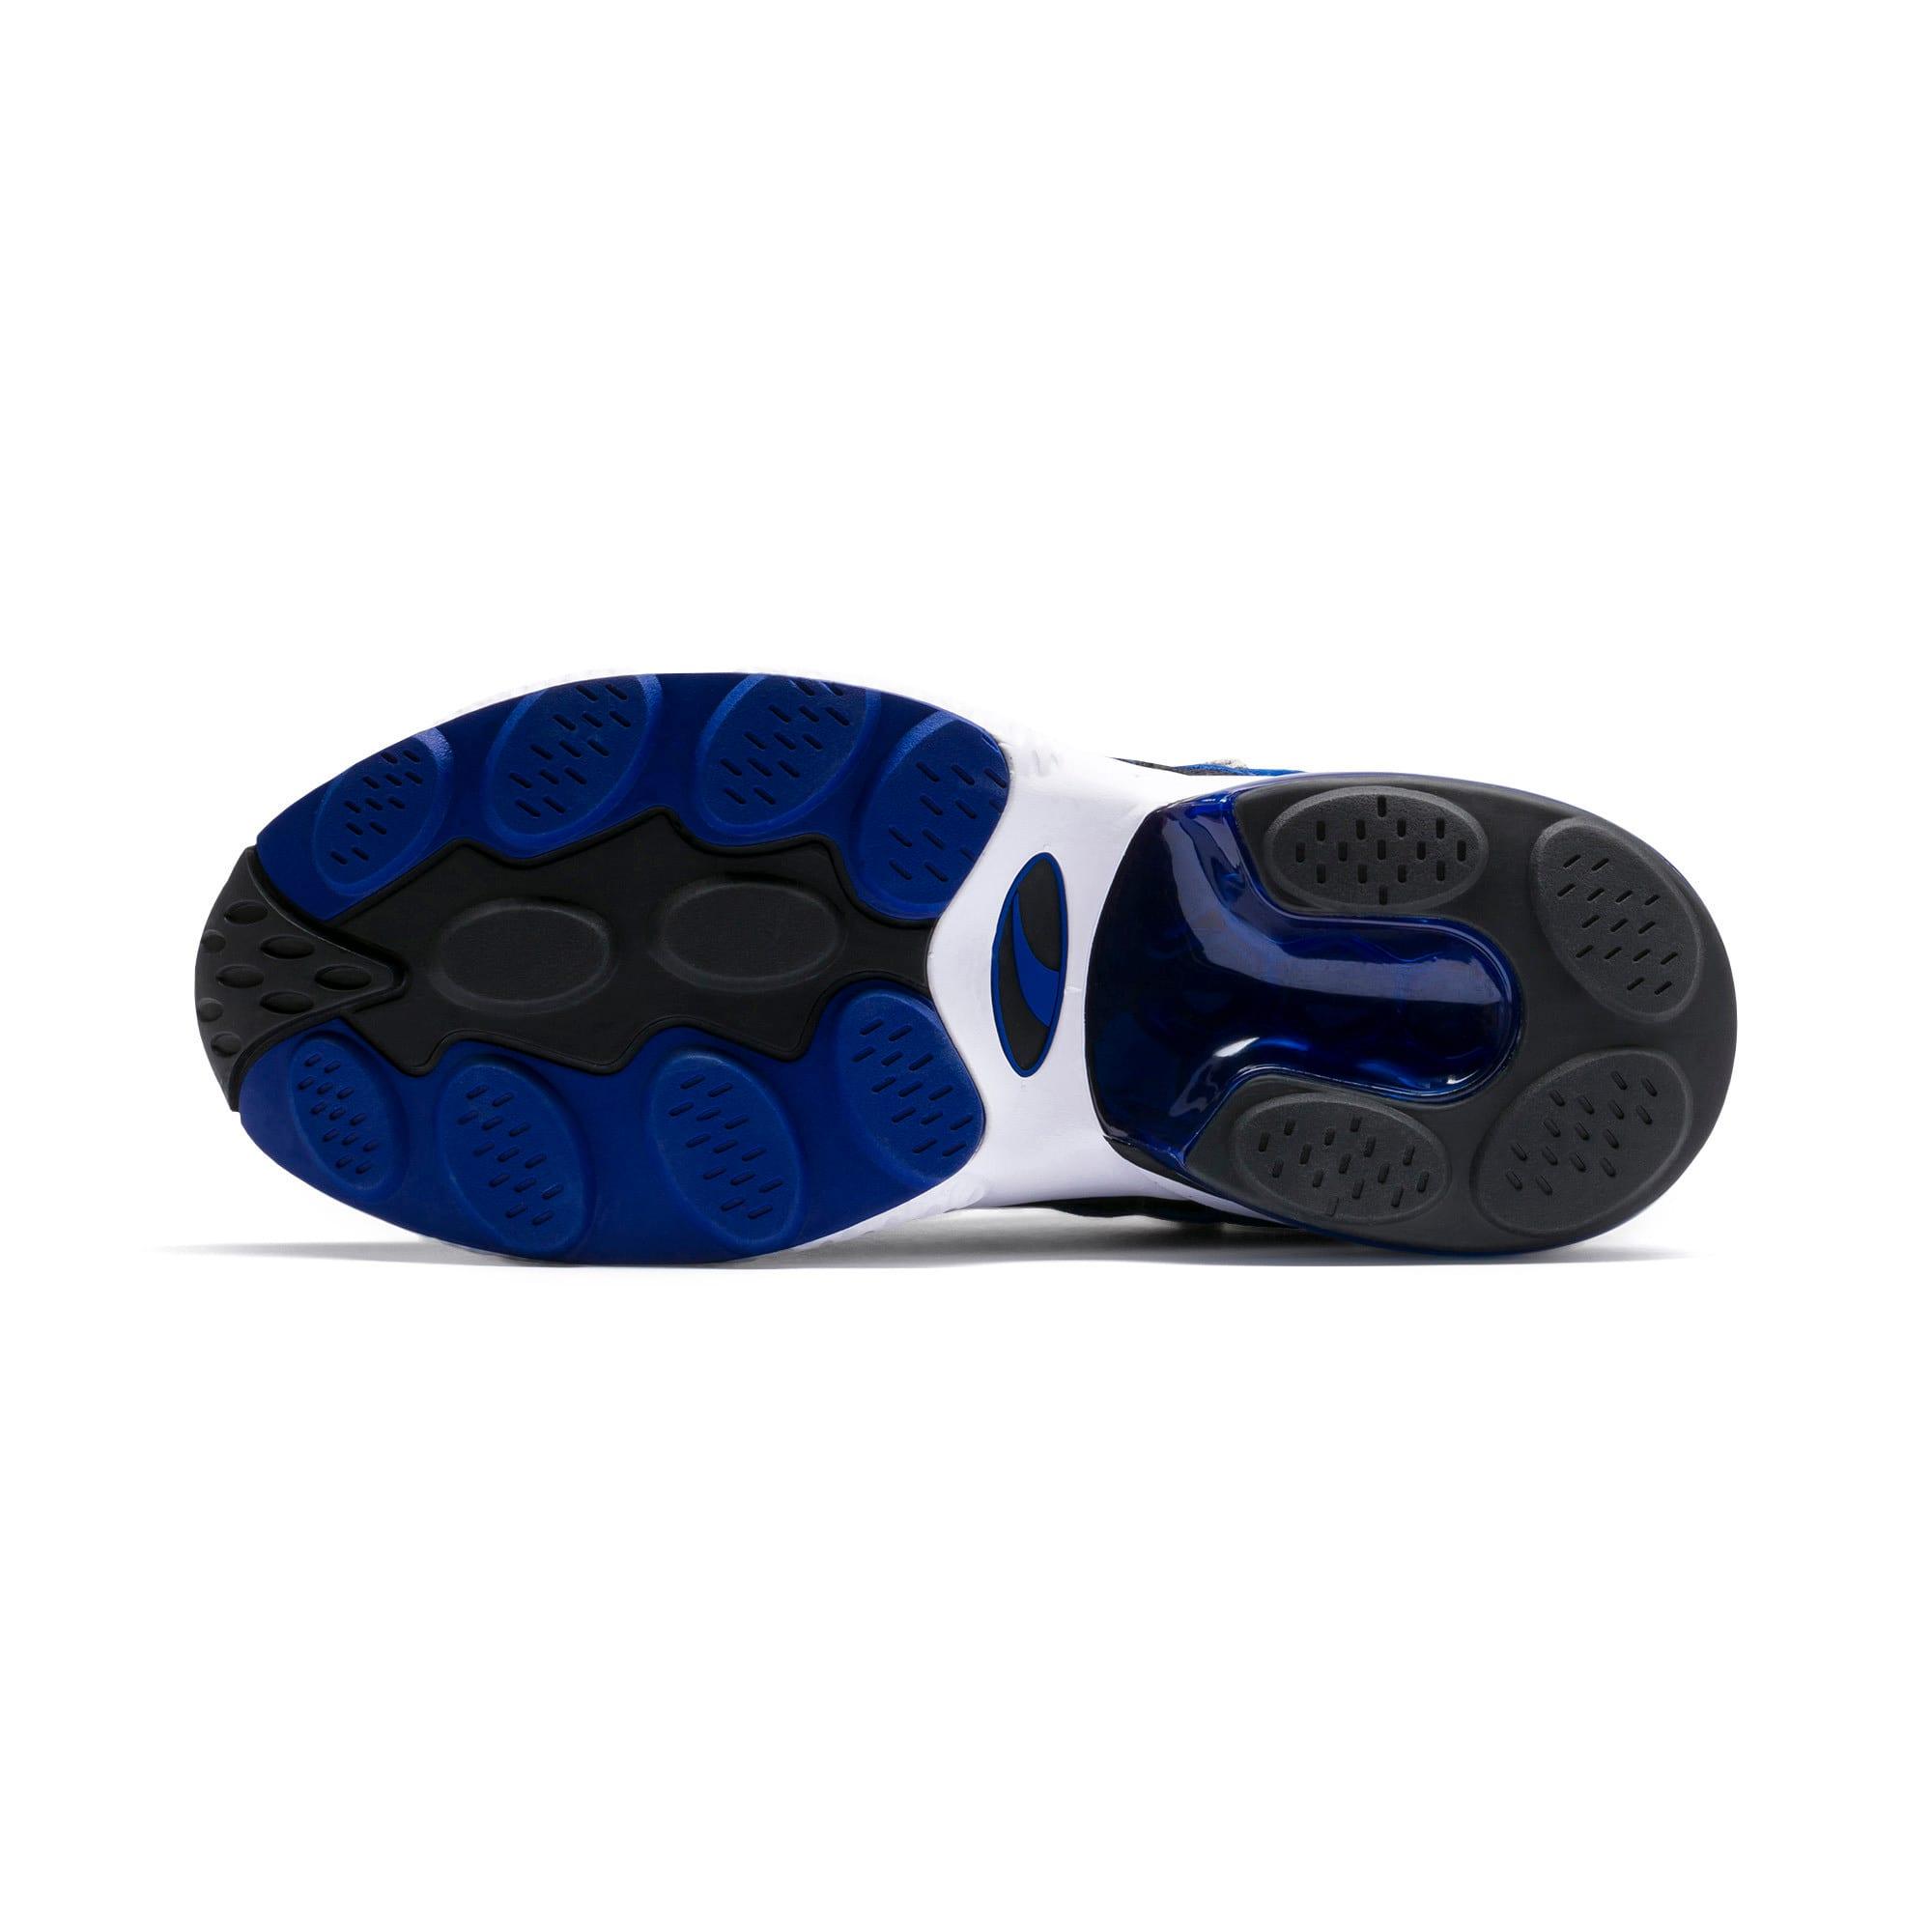 Thumbnail 3 of CELL Venom Men's Sneakers, Puma Black-Surf The Web, medium